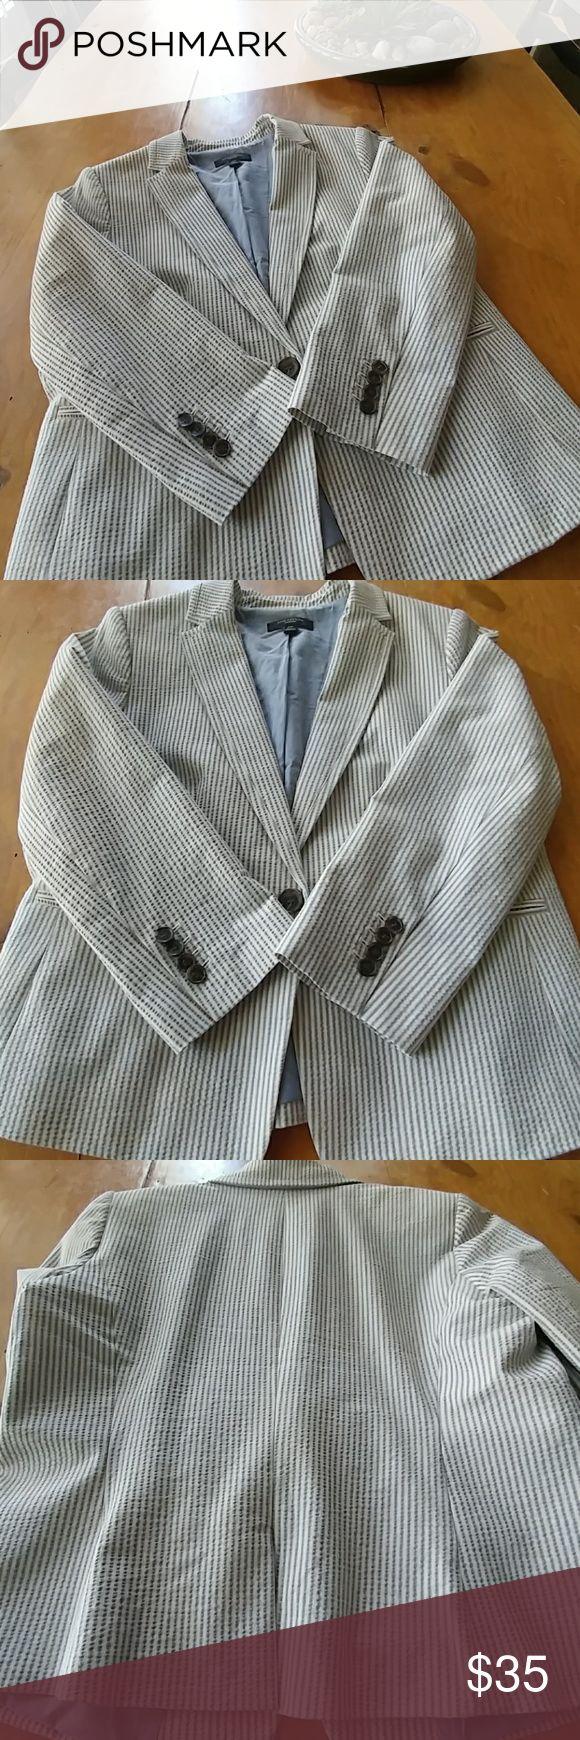 Ann Taylor Seersucker Blazer Blue & Cream Seersucker Blazer labeled 12P. Definitely runs SMALL more like a small 10P. Worn 1 maybe 2 times. Comfortable because if it's 95% Cotton/5% Spandex Fabric. Ann Taylor Jackets & Coats Blazers